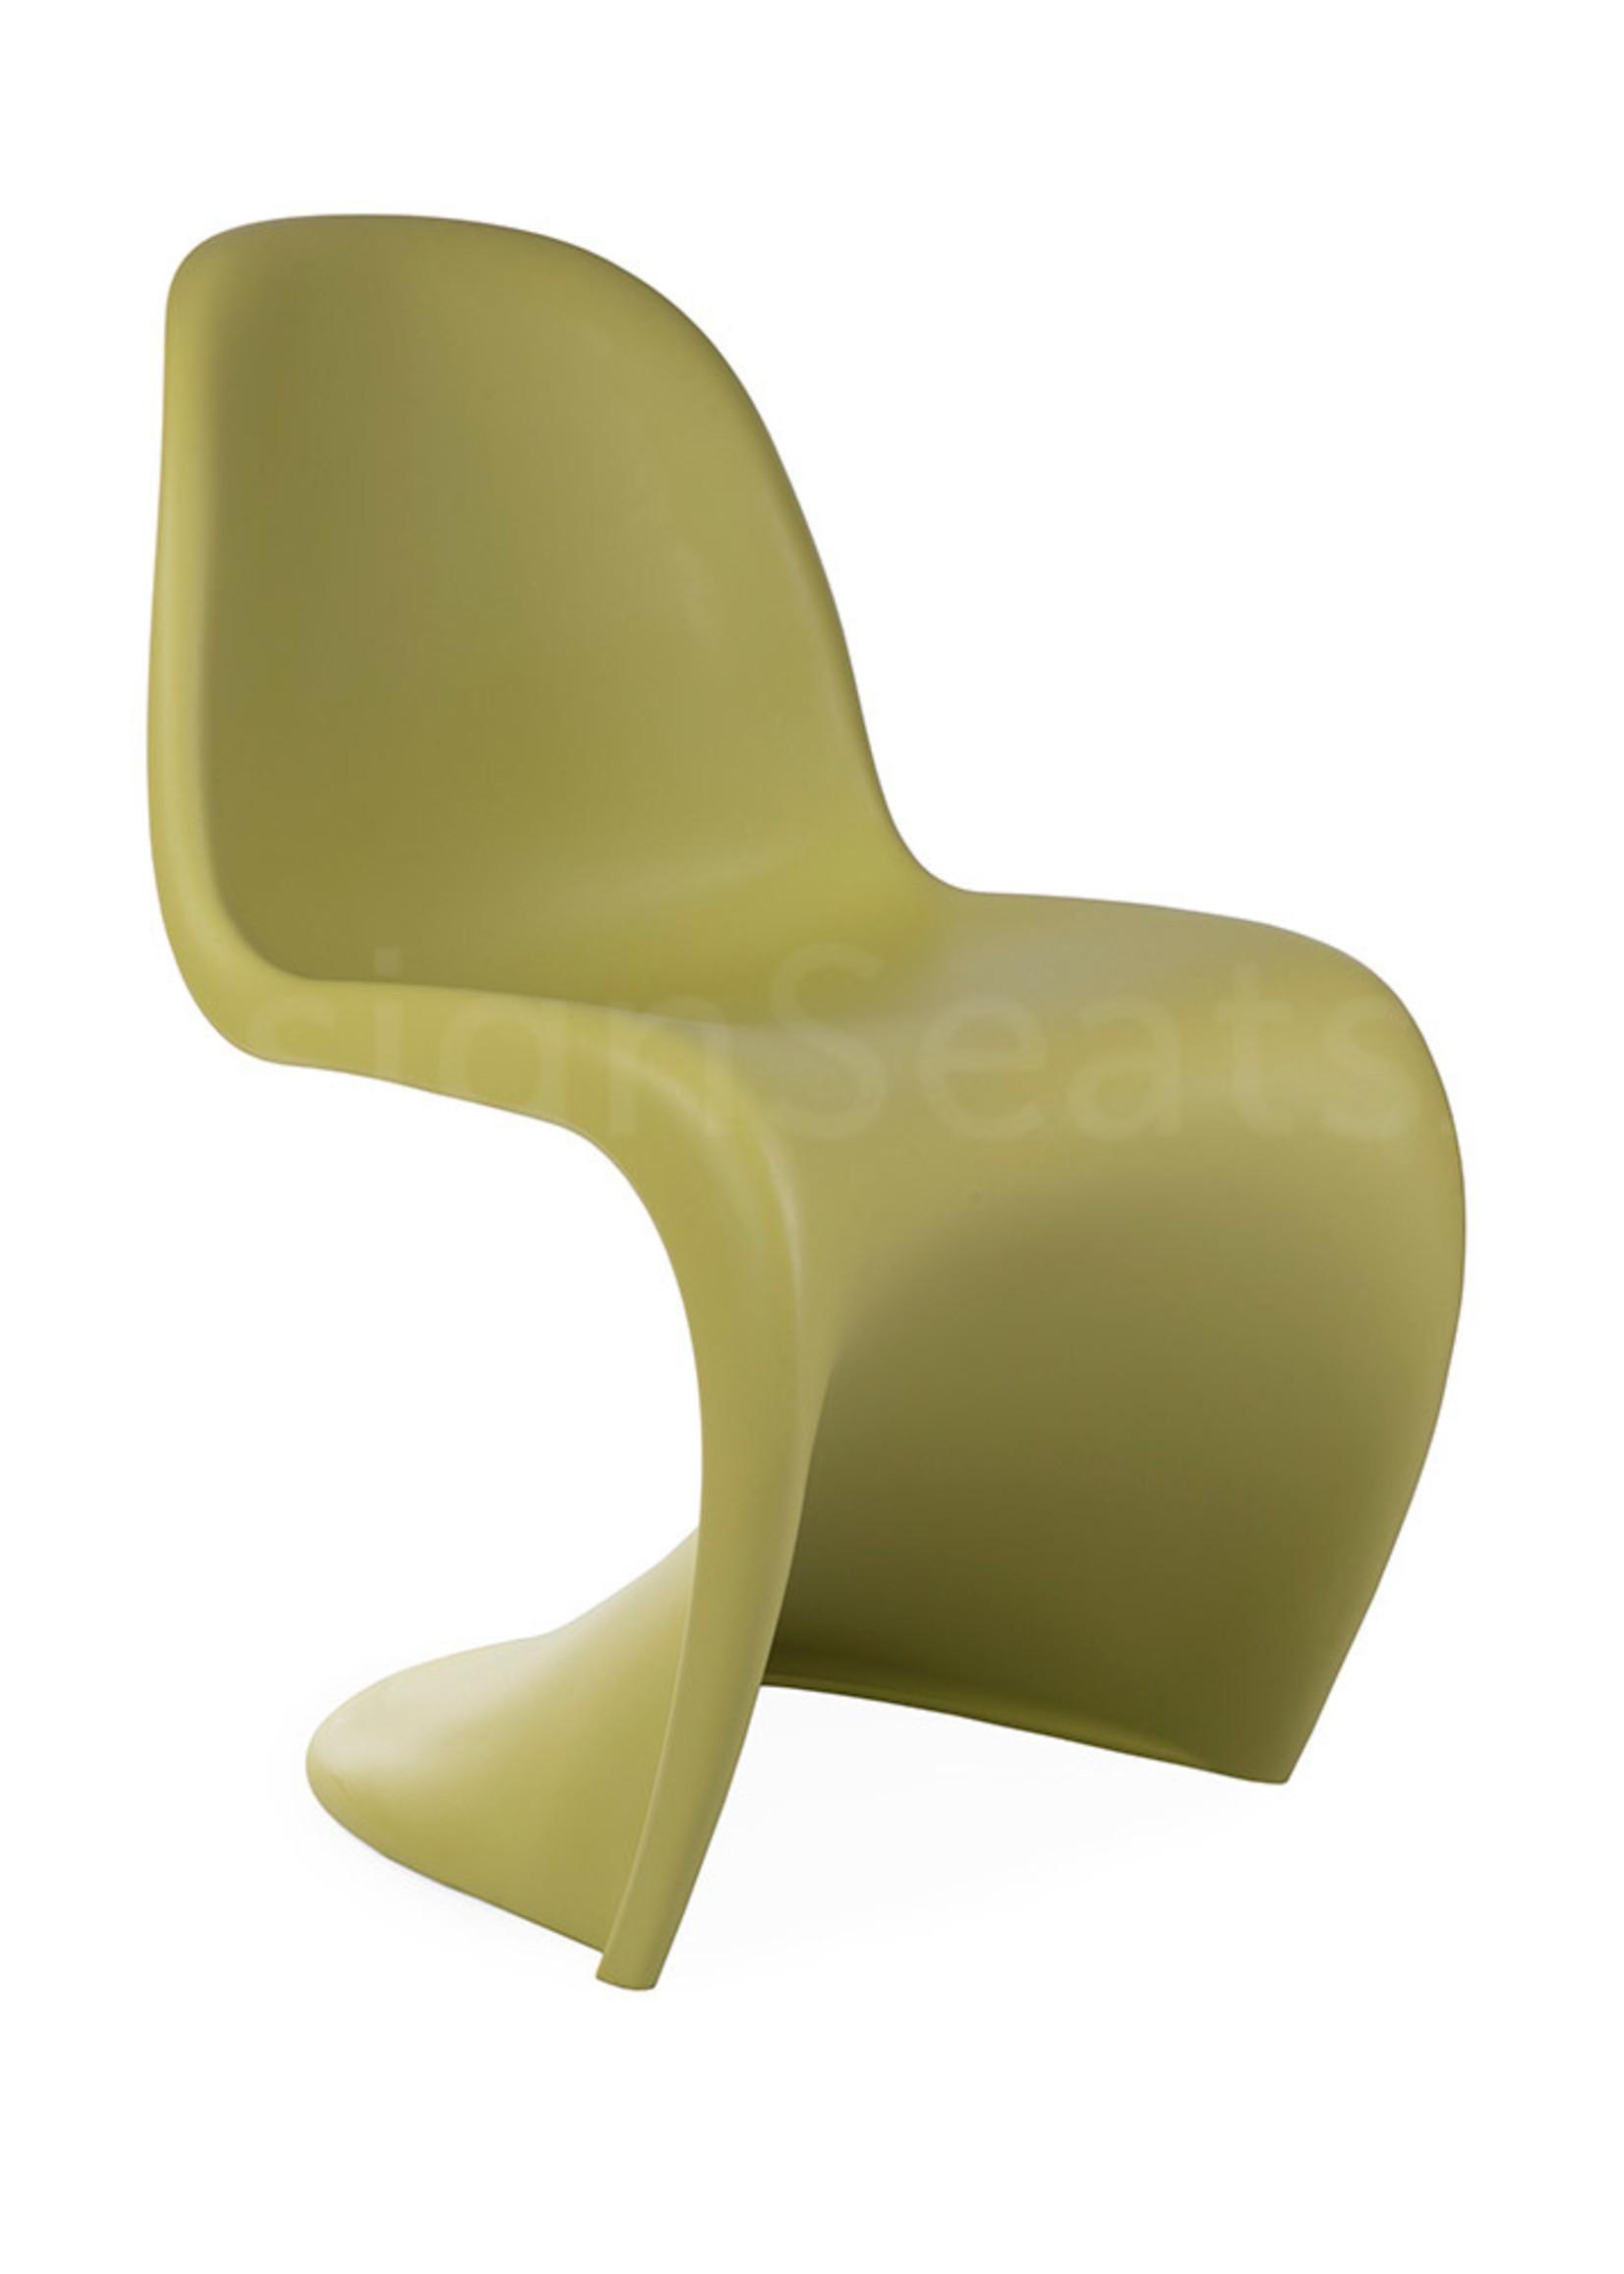 Verner Panton S Chair